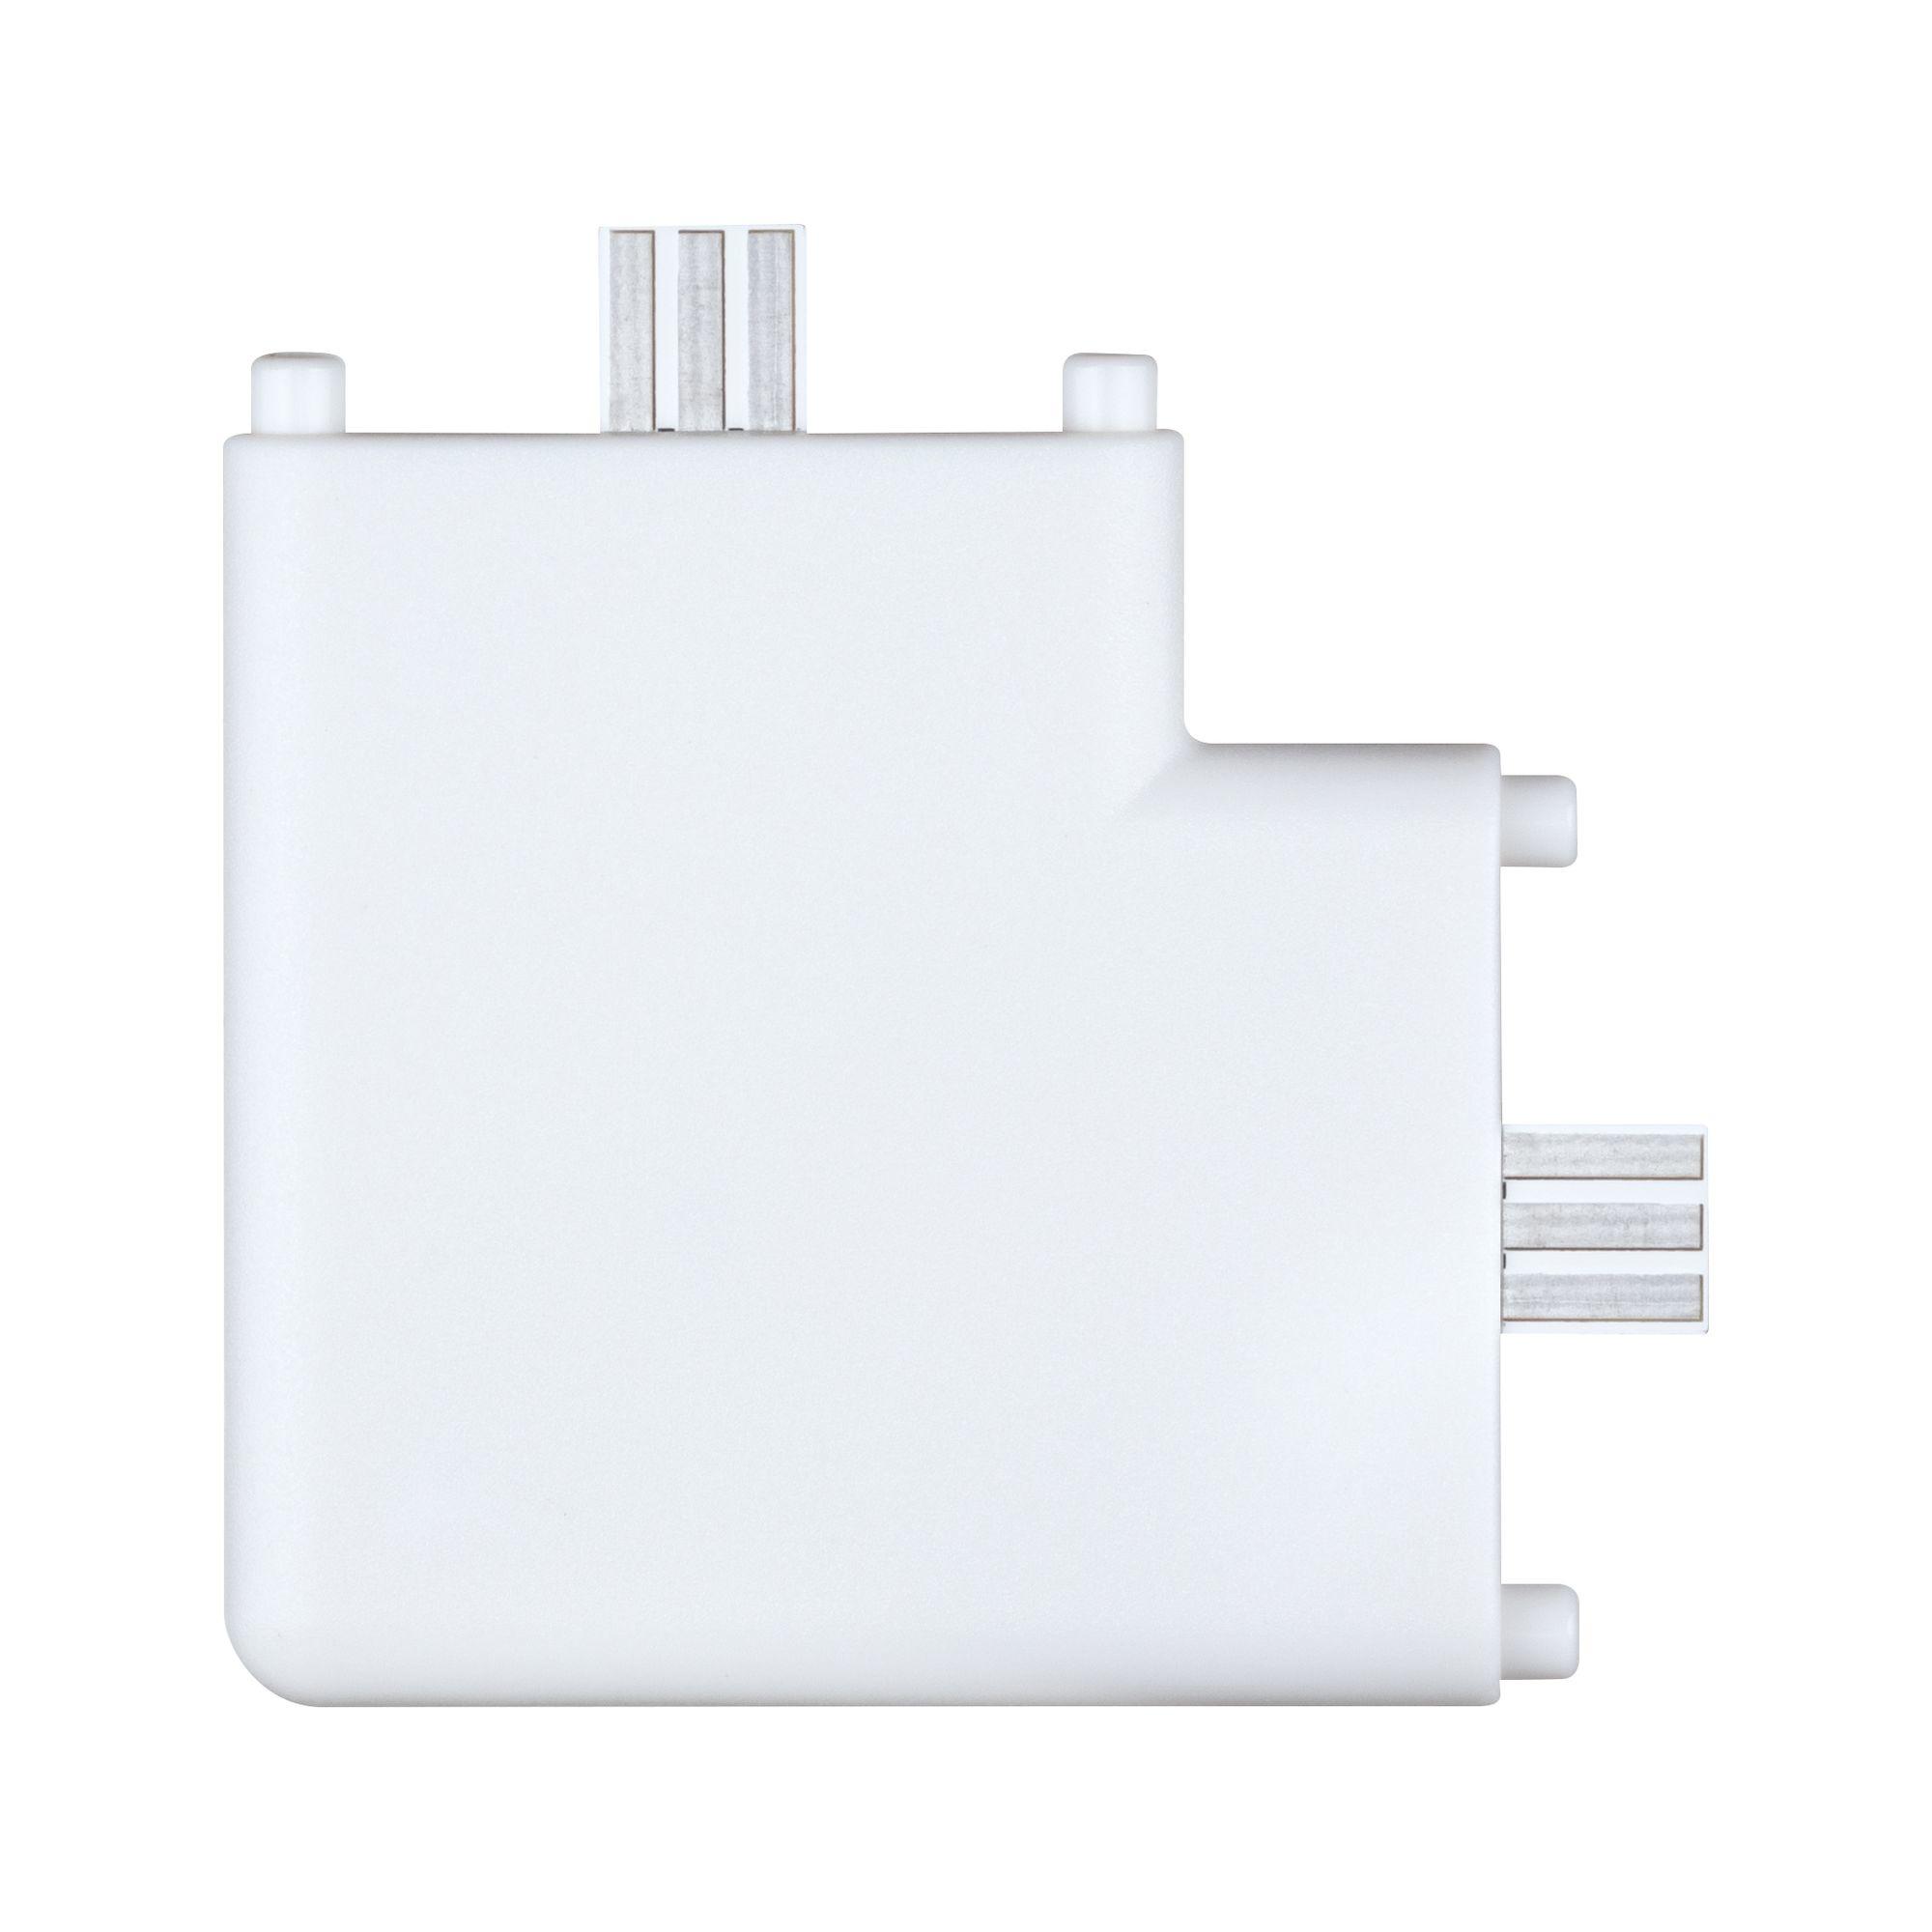 Paulmann Möbelleuchten Clever Connect Eck-Verbinder Border Weiß matt 12V